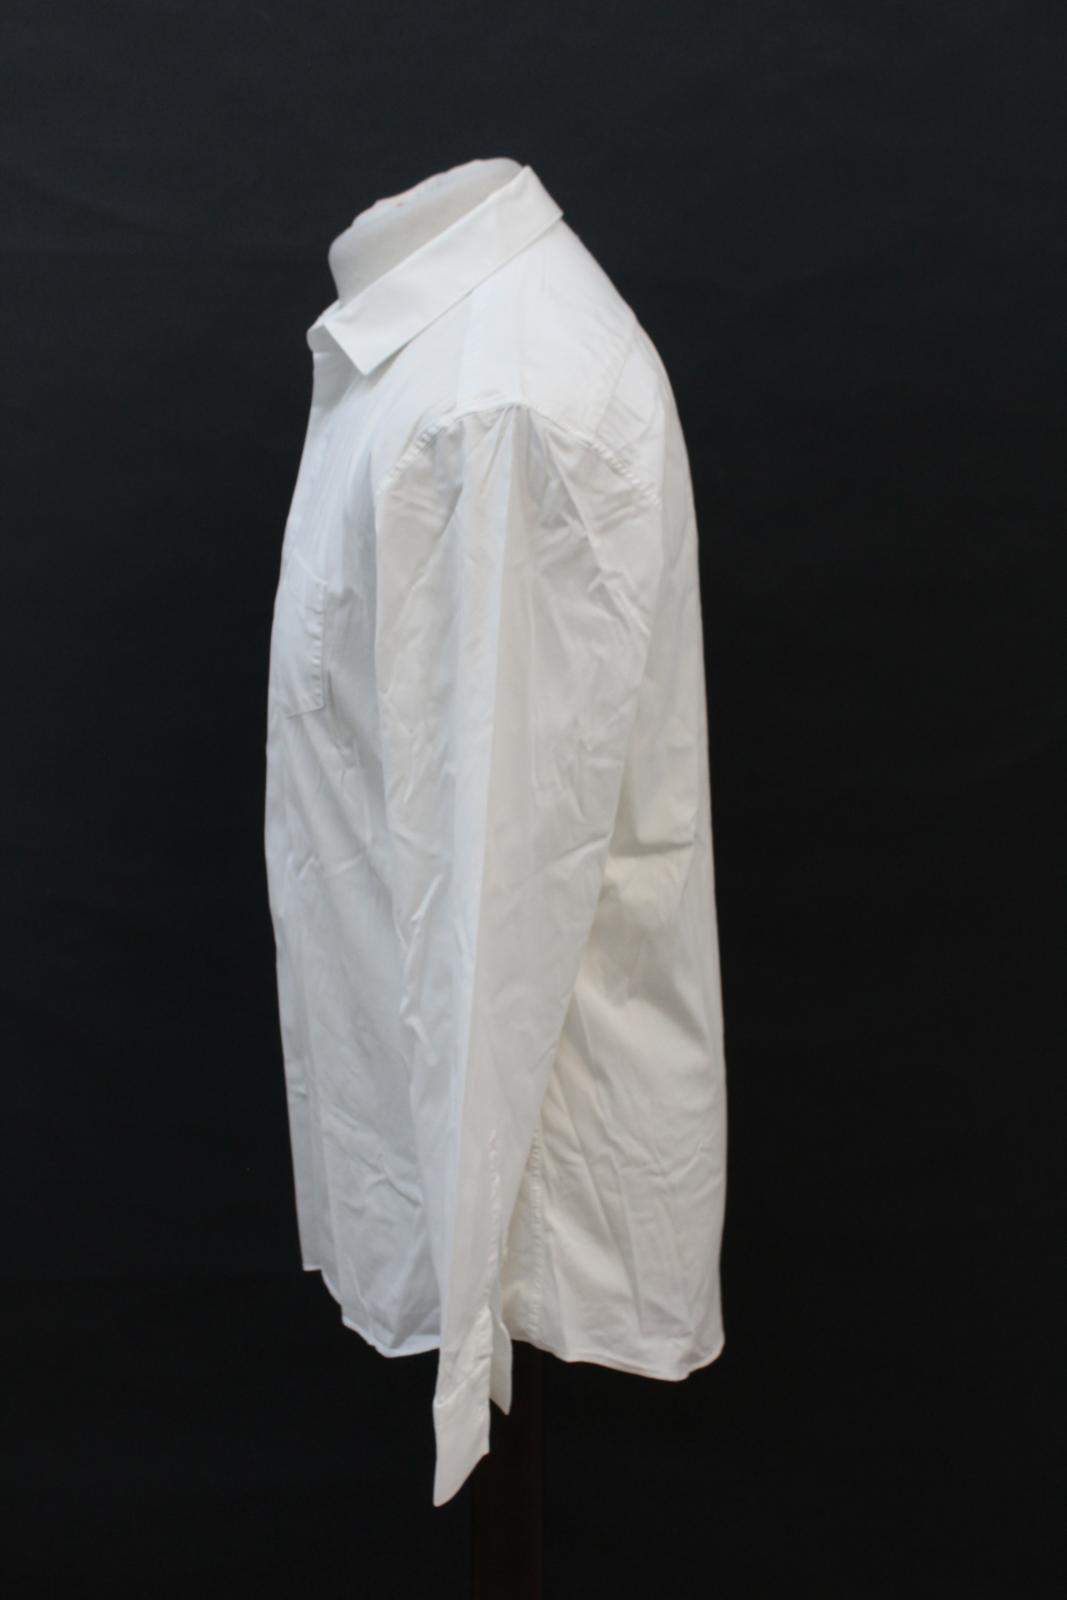 NEIL-BARRETT-Men-039-s-White-Cotton-Blend-Slim-Fit-Formal-Shirt-Collar-16-5-034-42cm miniatura 6